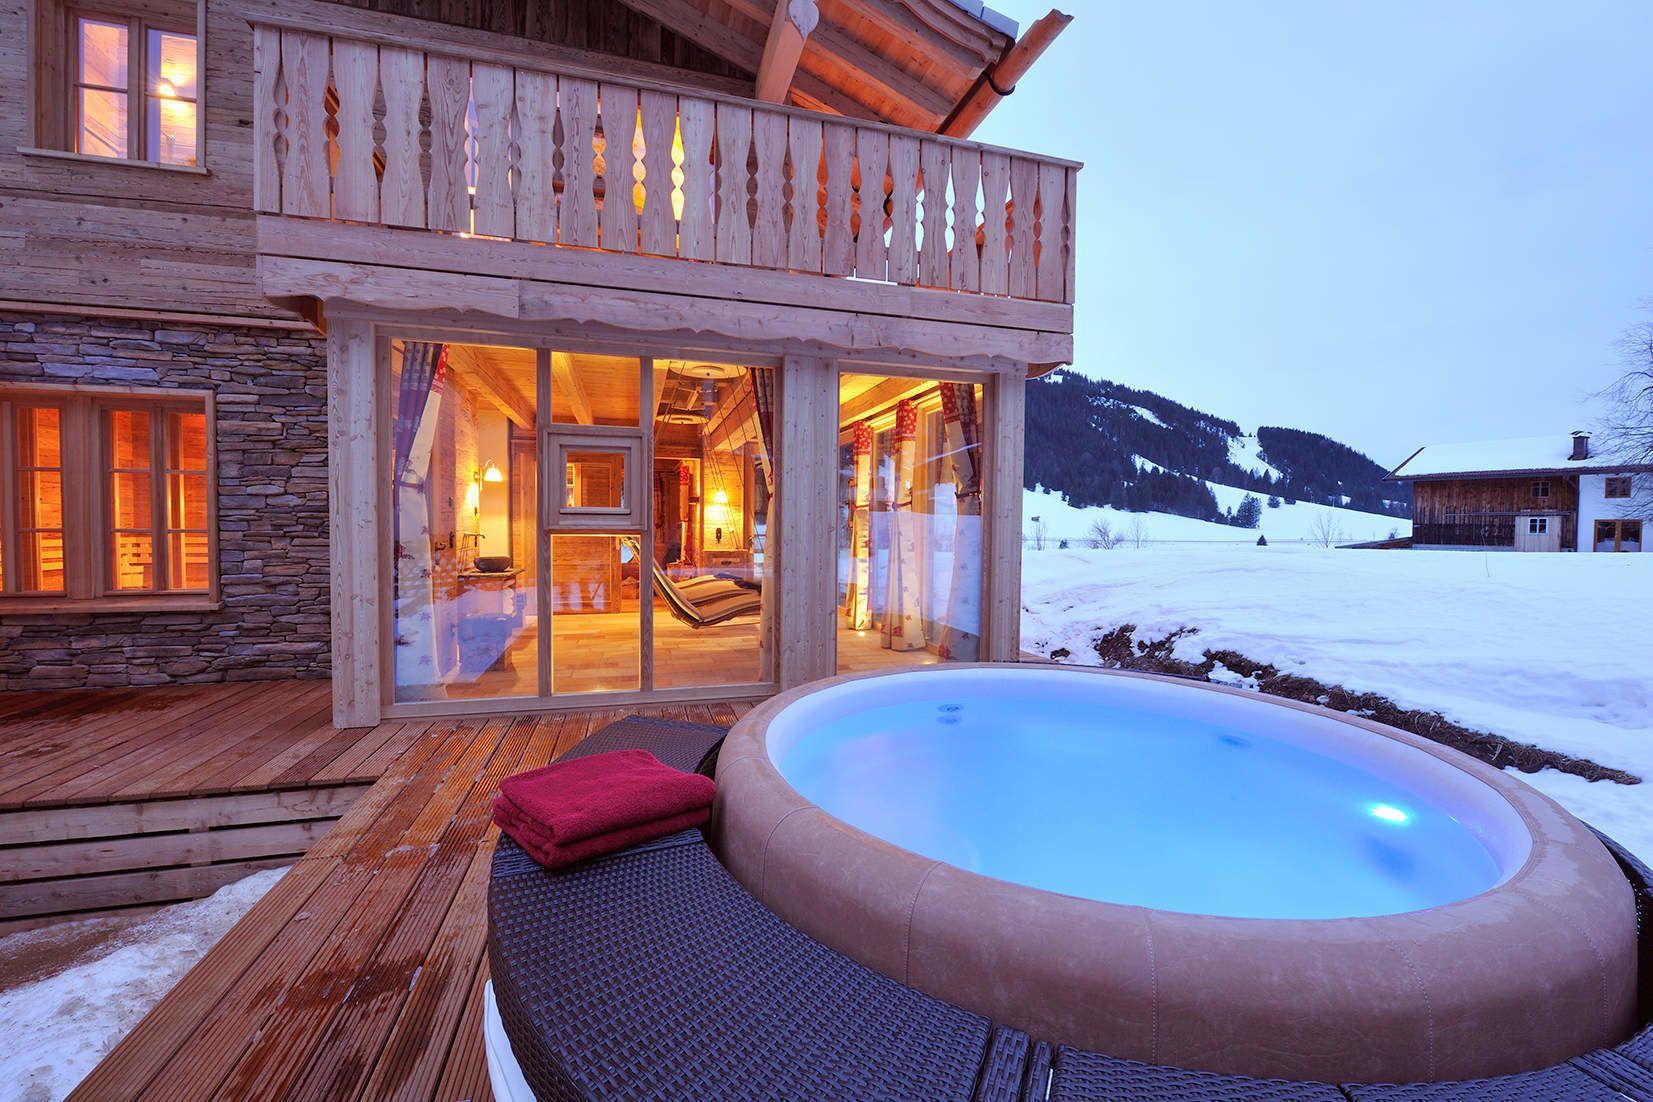 wohlf hl chalet chalet grand fl h tannheimer tal luxus chalets tirol ferienh user allg u. Black Bedroom Furniture Sets. Home Design Ideas